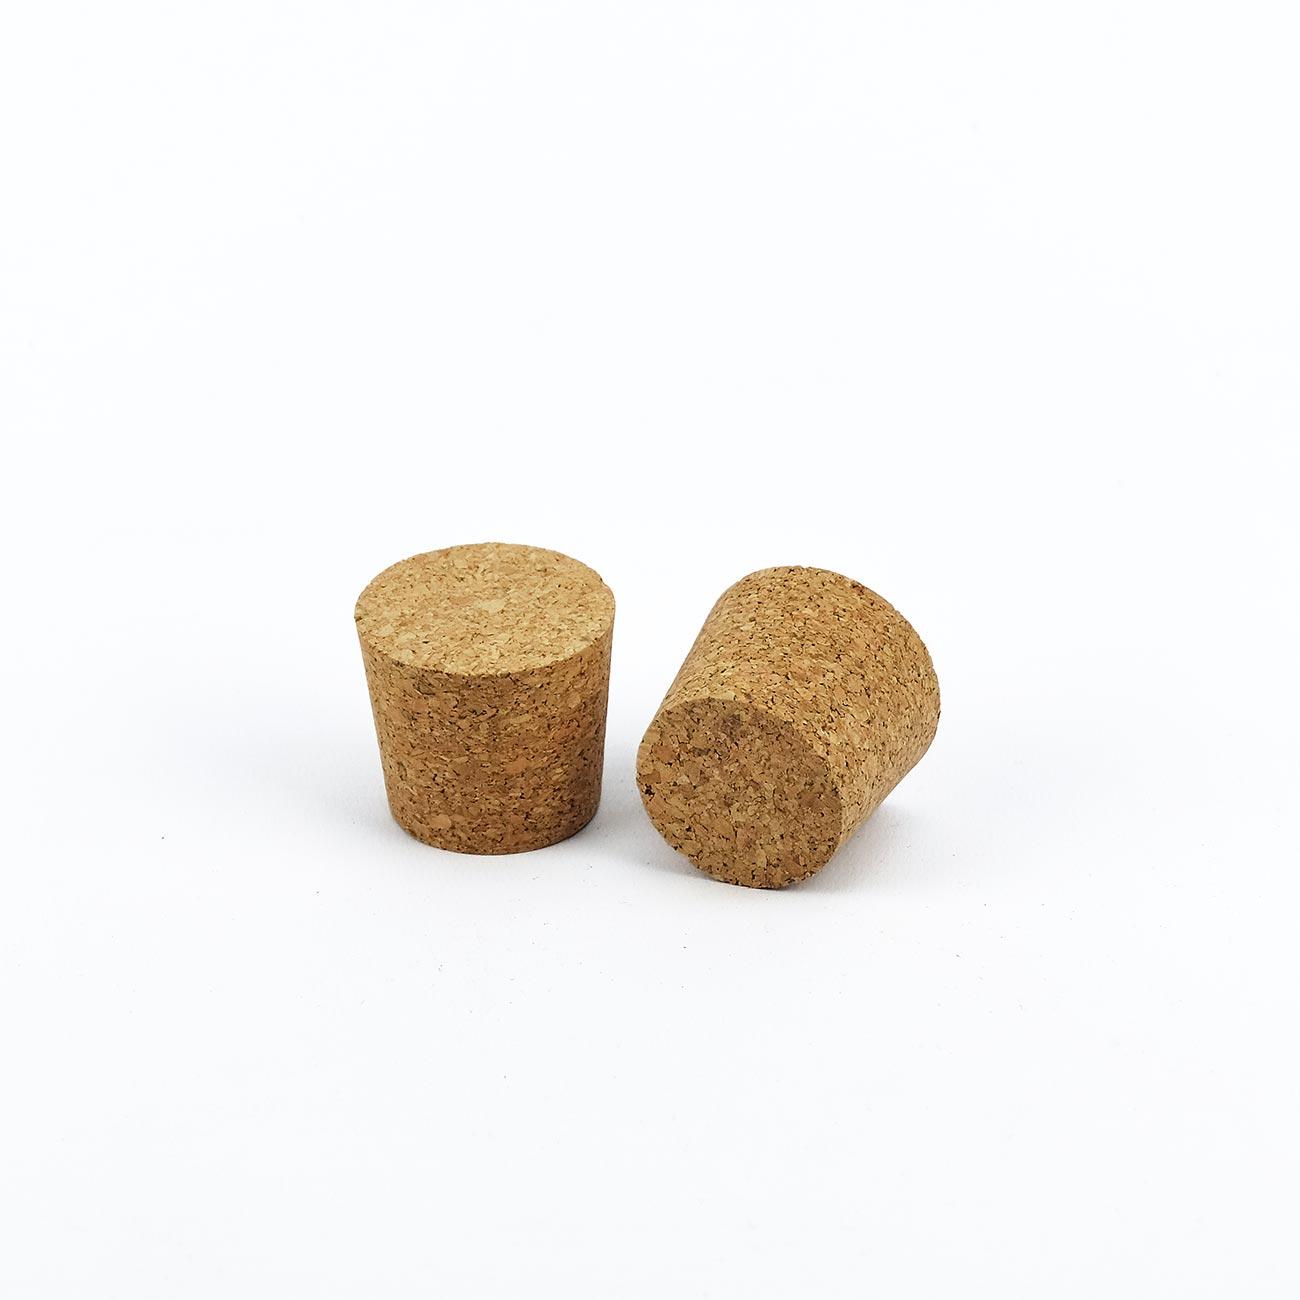 kurk-stekkie-medium-en-large-ecosysteem-diameter-43-36-mm